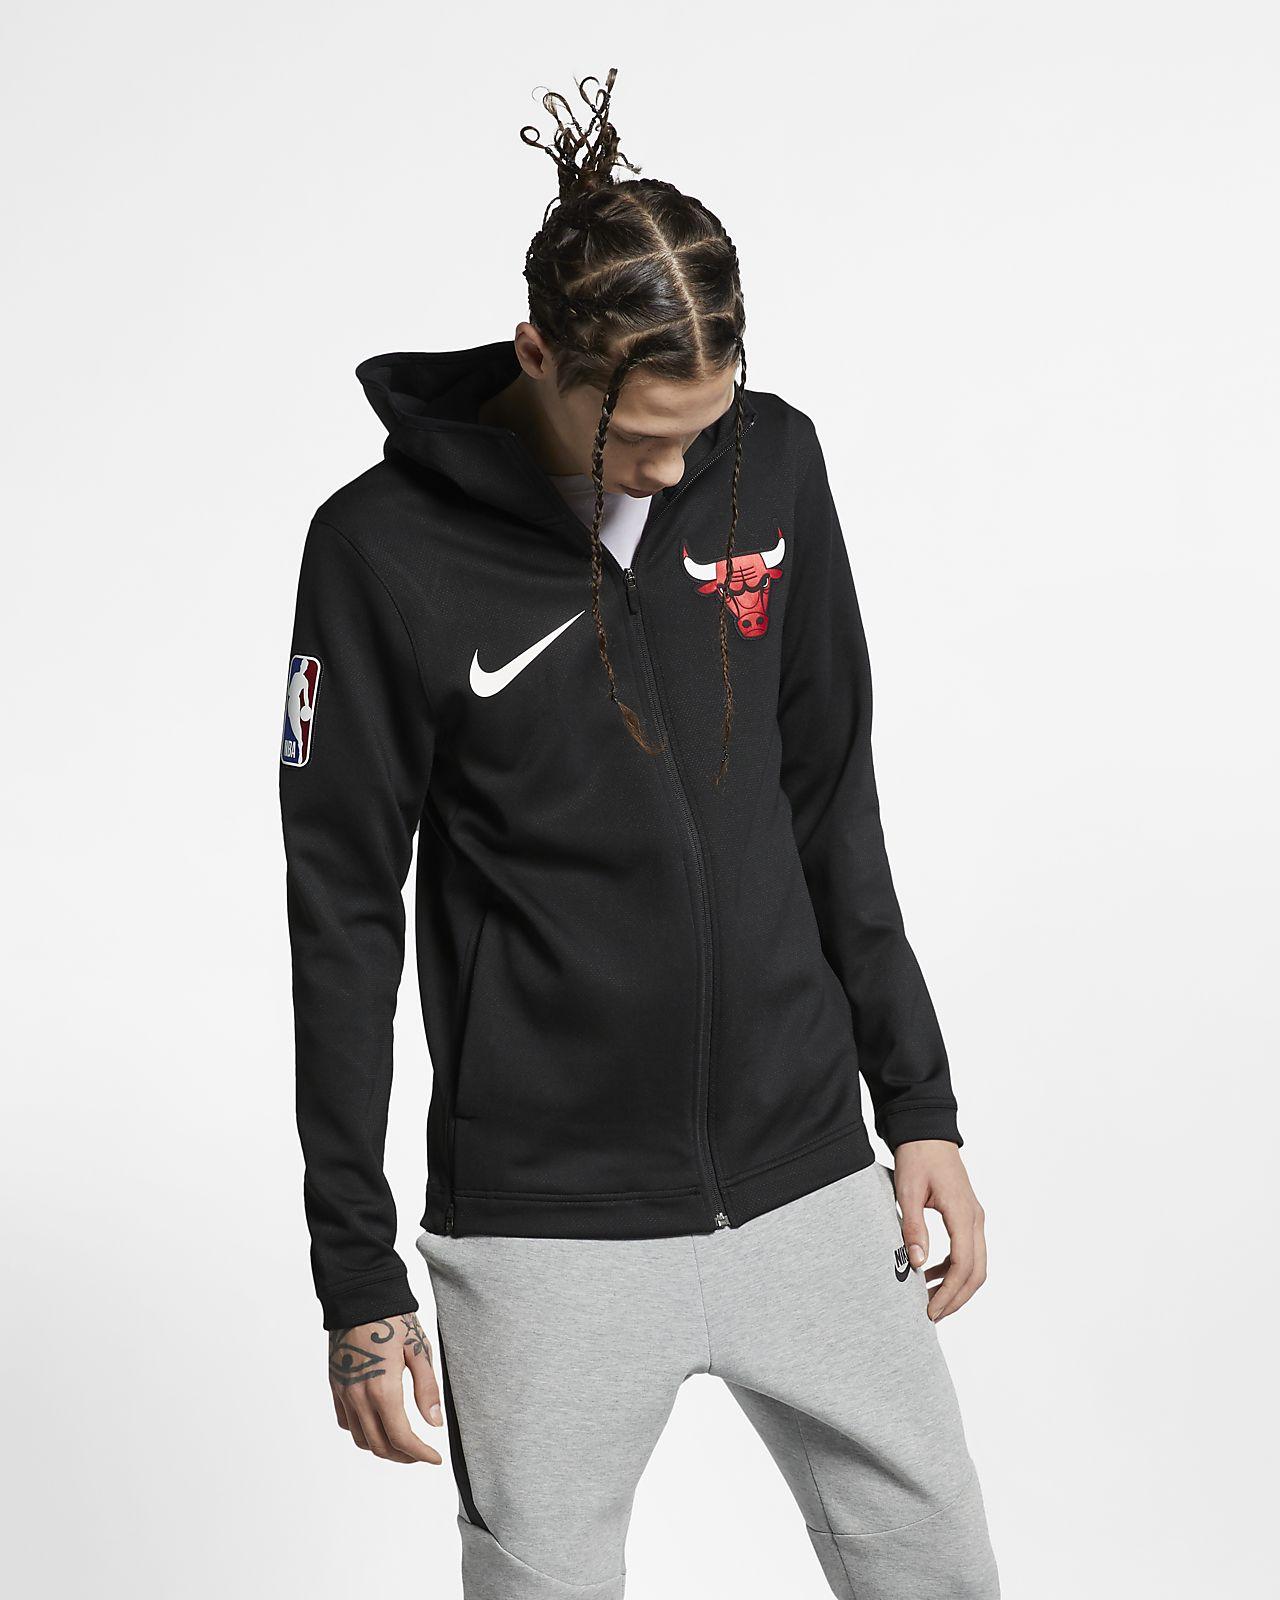 64dd1b6356adb5 Chicago Bulls Nike Therma Flex Showtime NBA-Hoodie für Herren. Nike ...